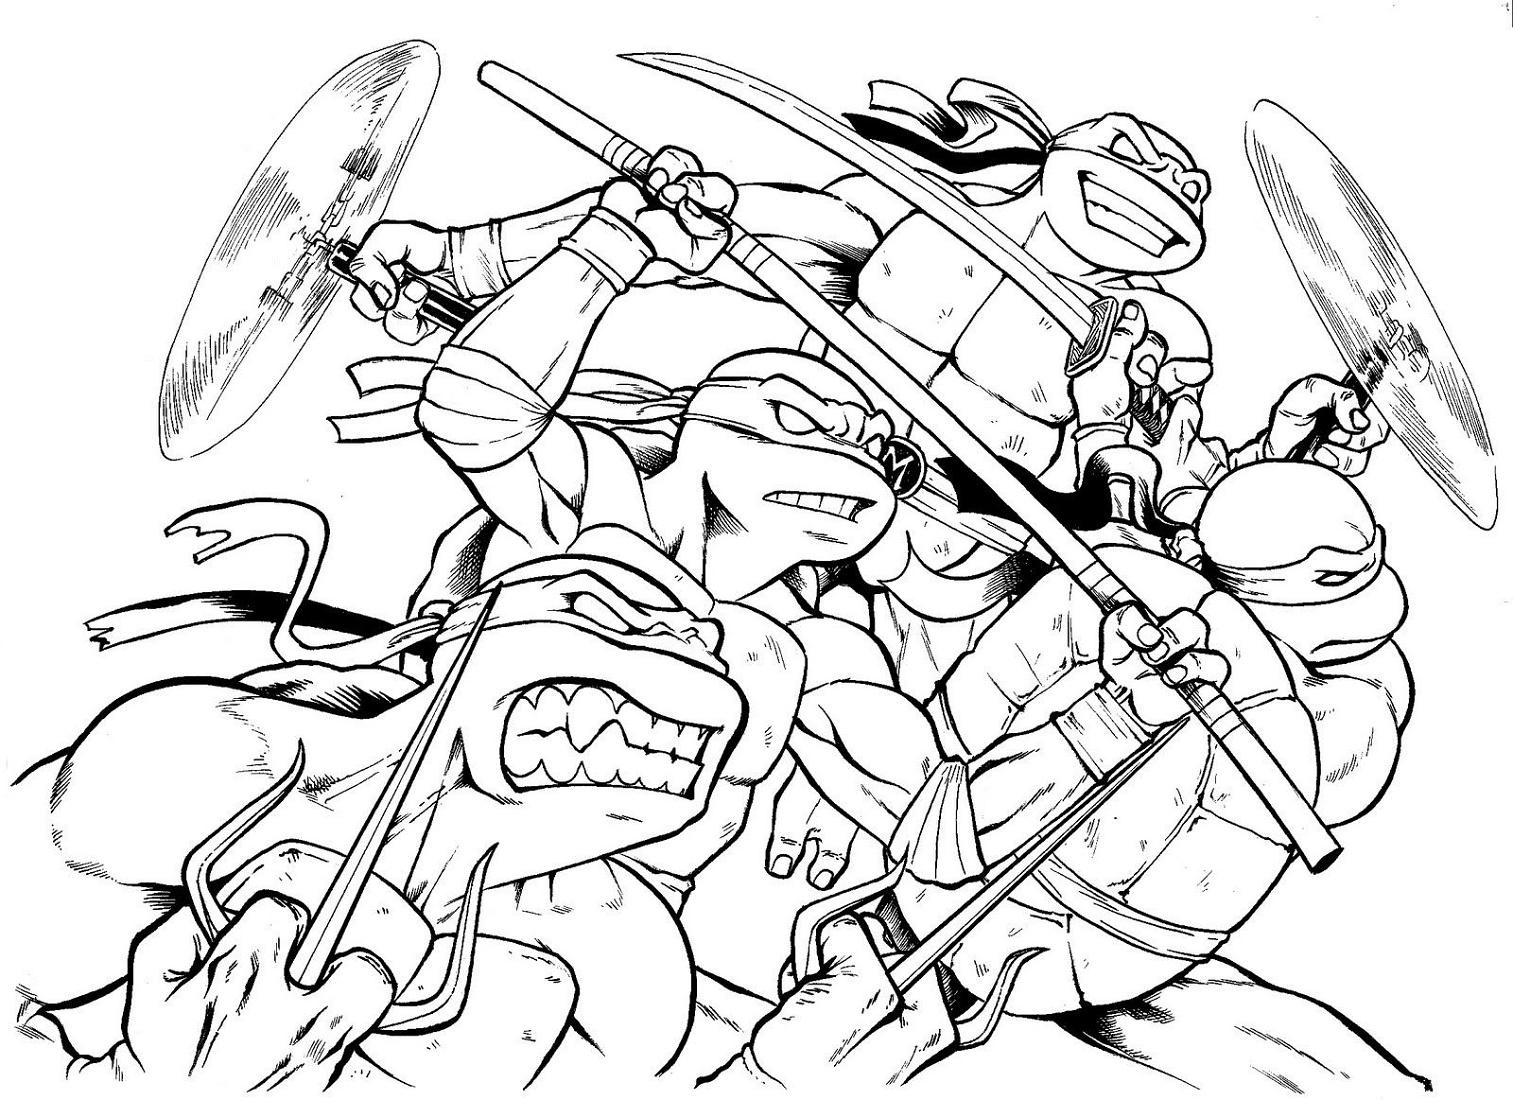 Teenage Mutant Ninja Turtles Coloring Pages To Print